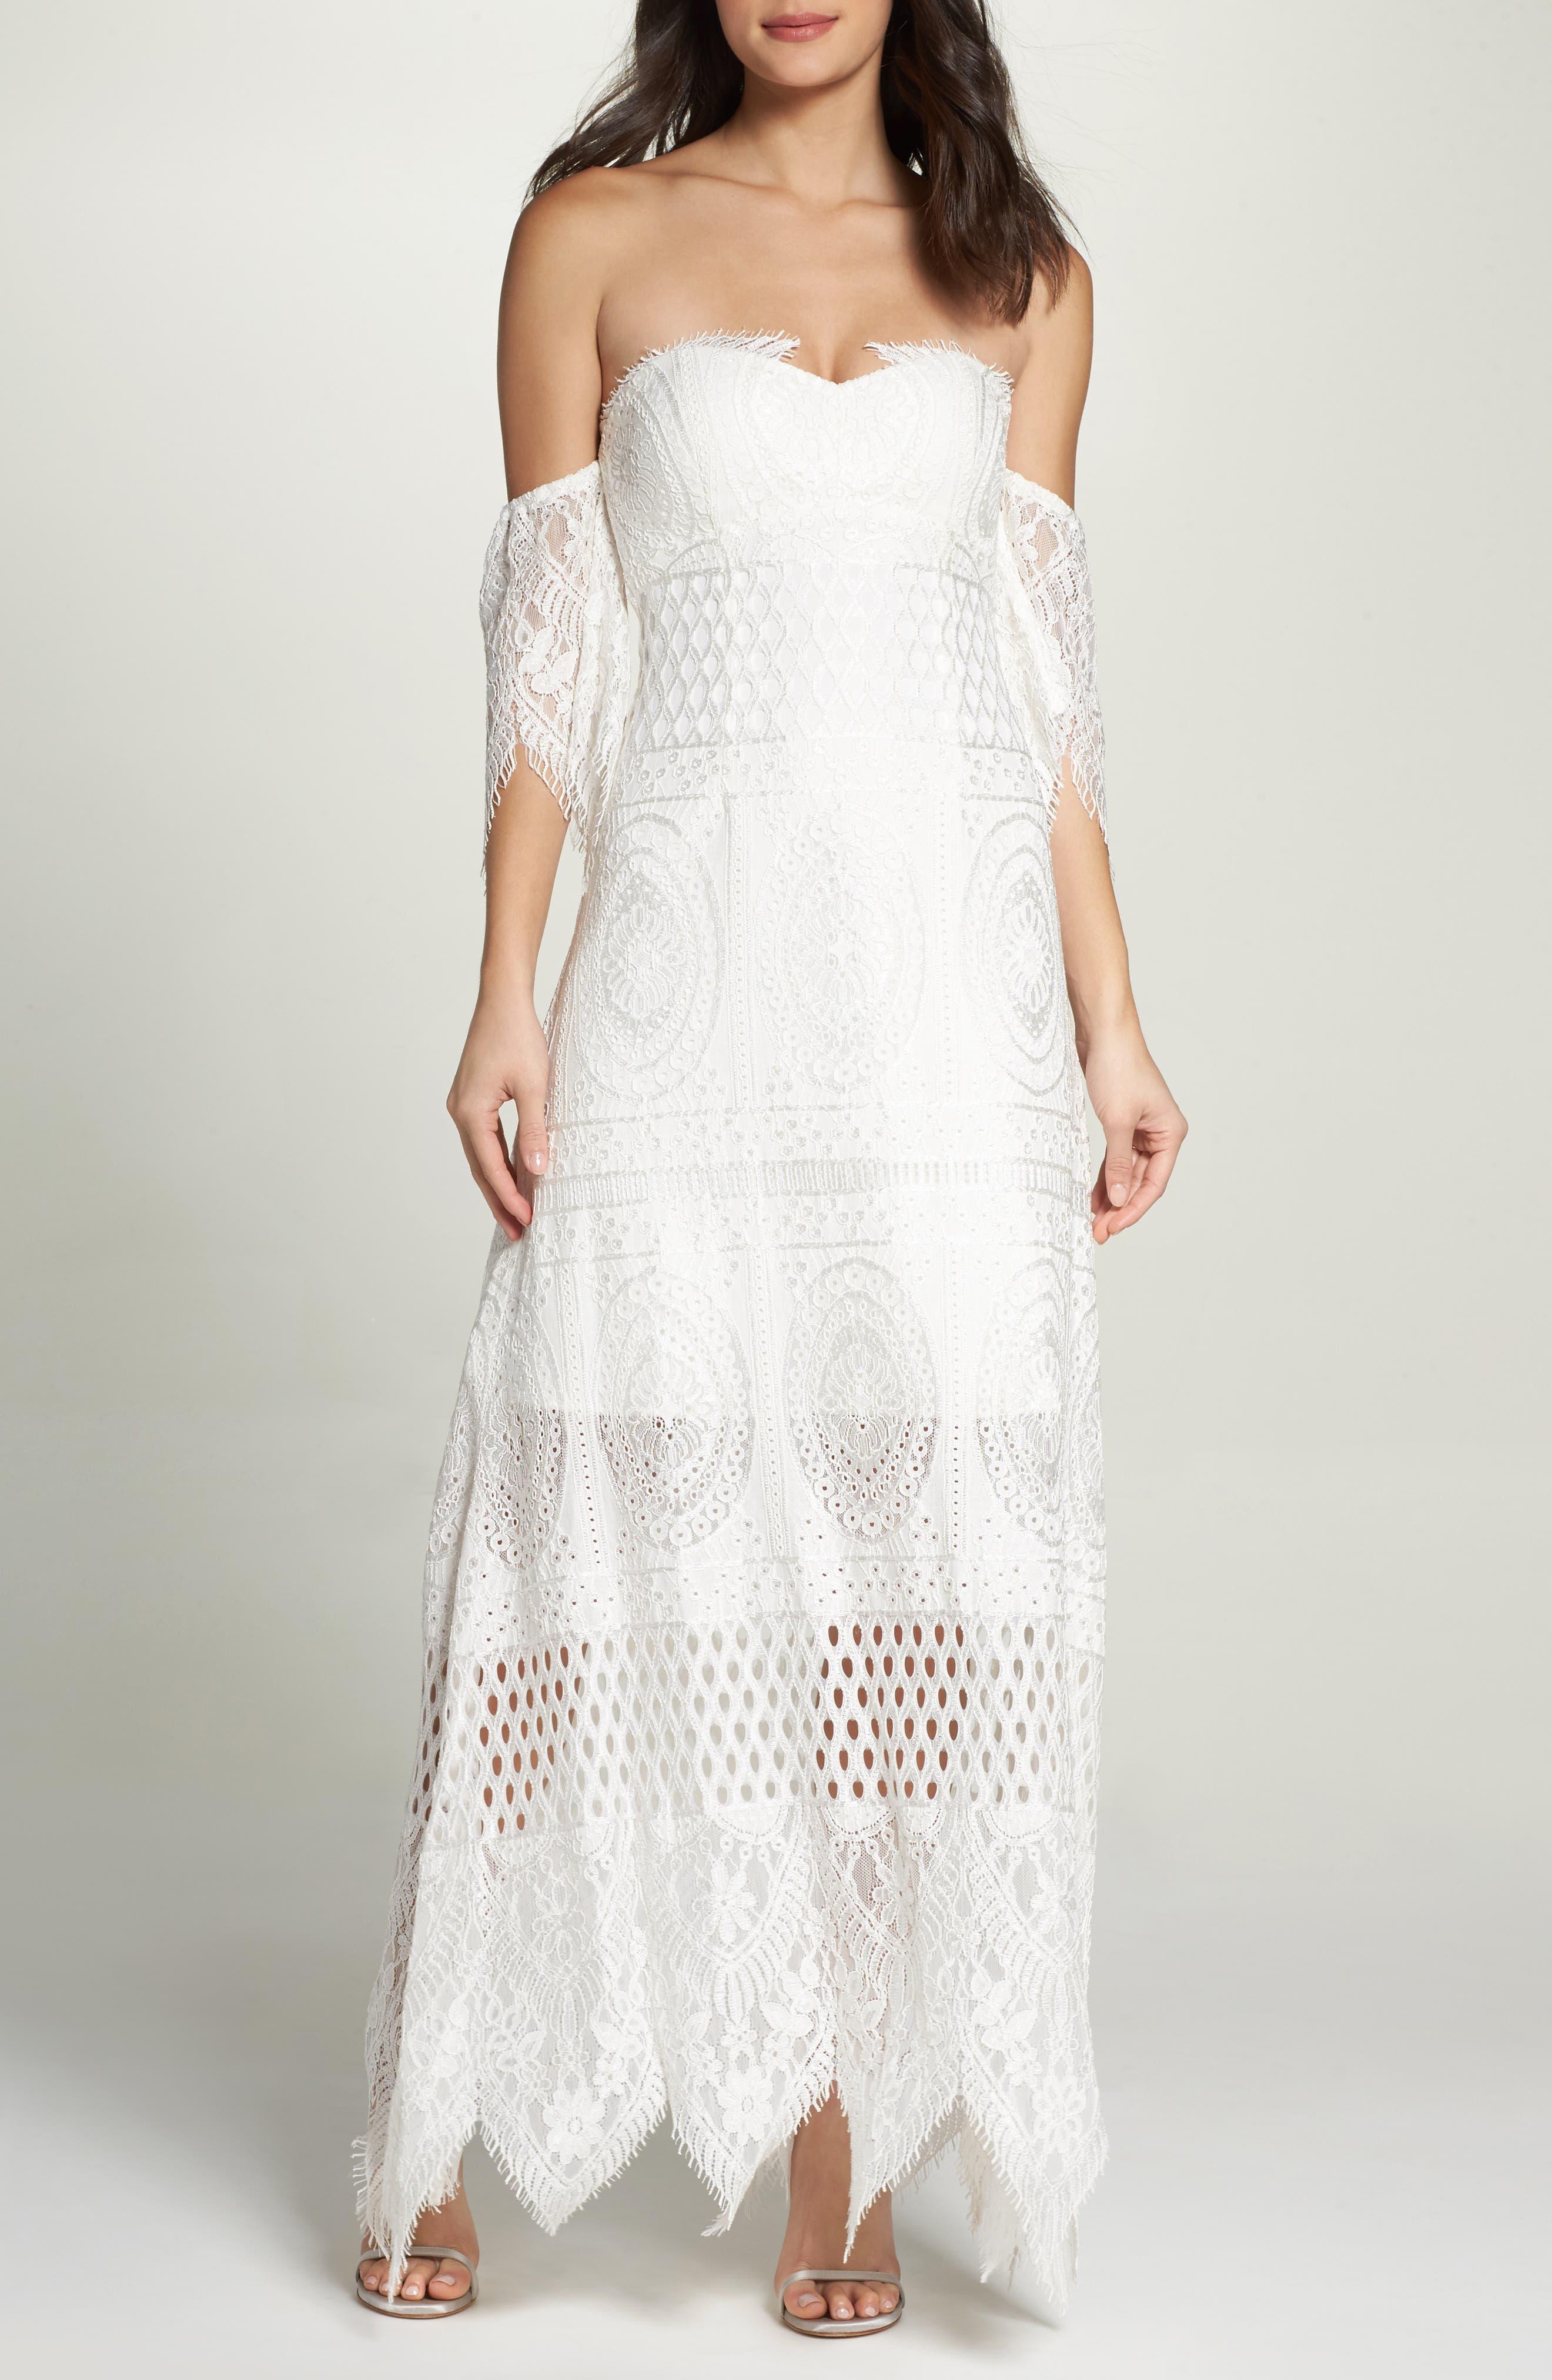 Lace Off the Shoulder Maxi Dress,                             Main thumbnail 1, color,                             900